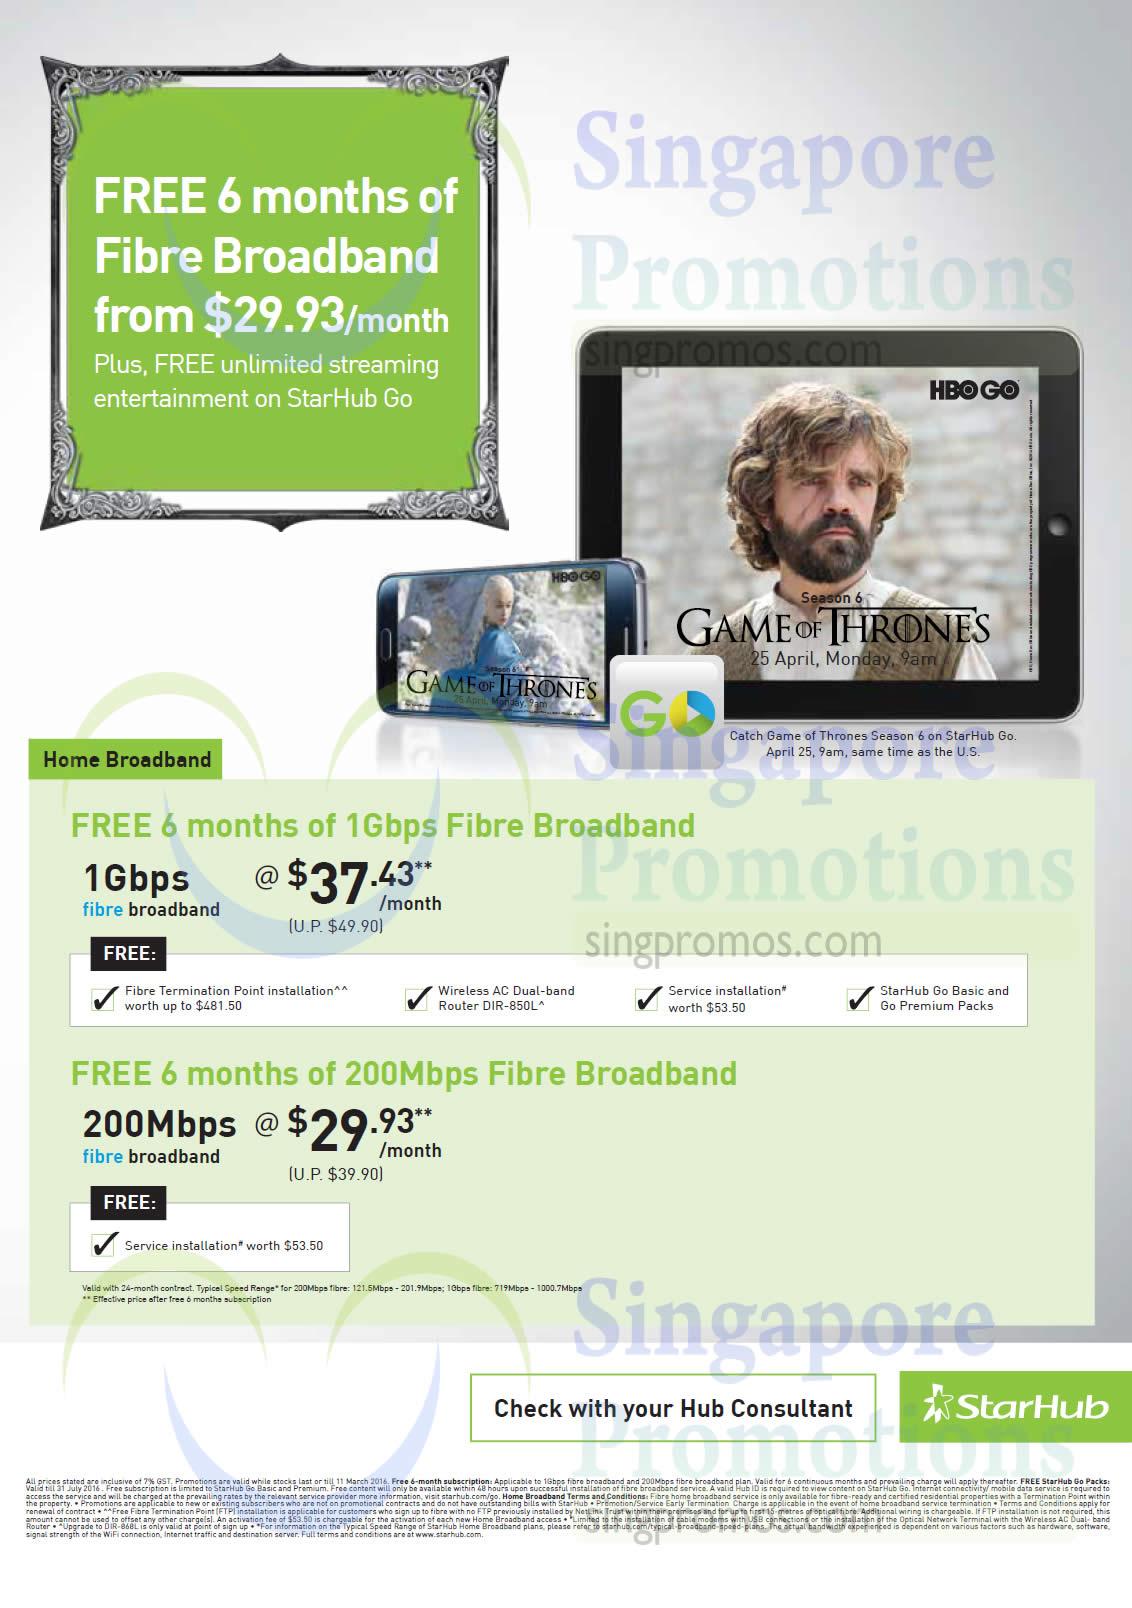 Home Broadband 37.43 1Gbps Fibre Broadband, 29.93 200Mbps Fibre Broadband